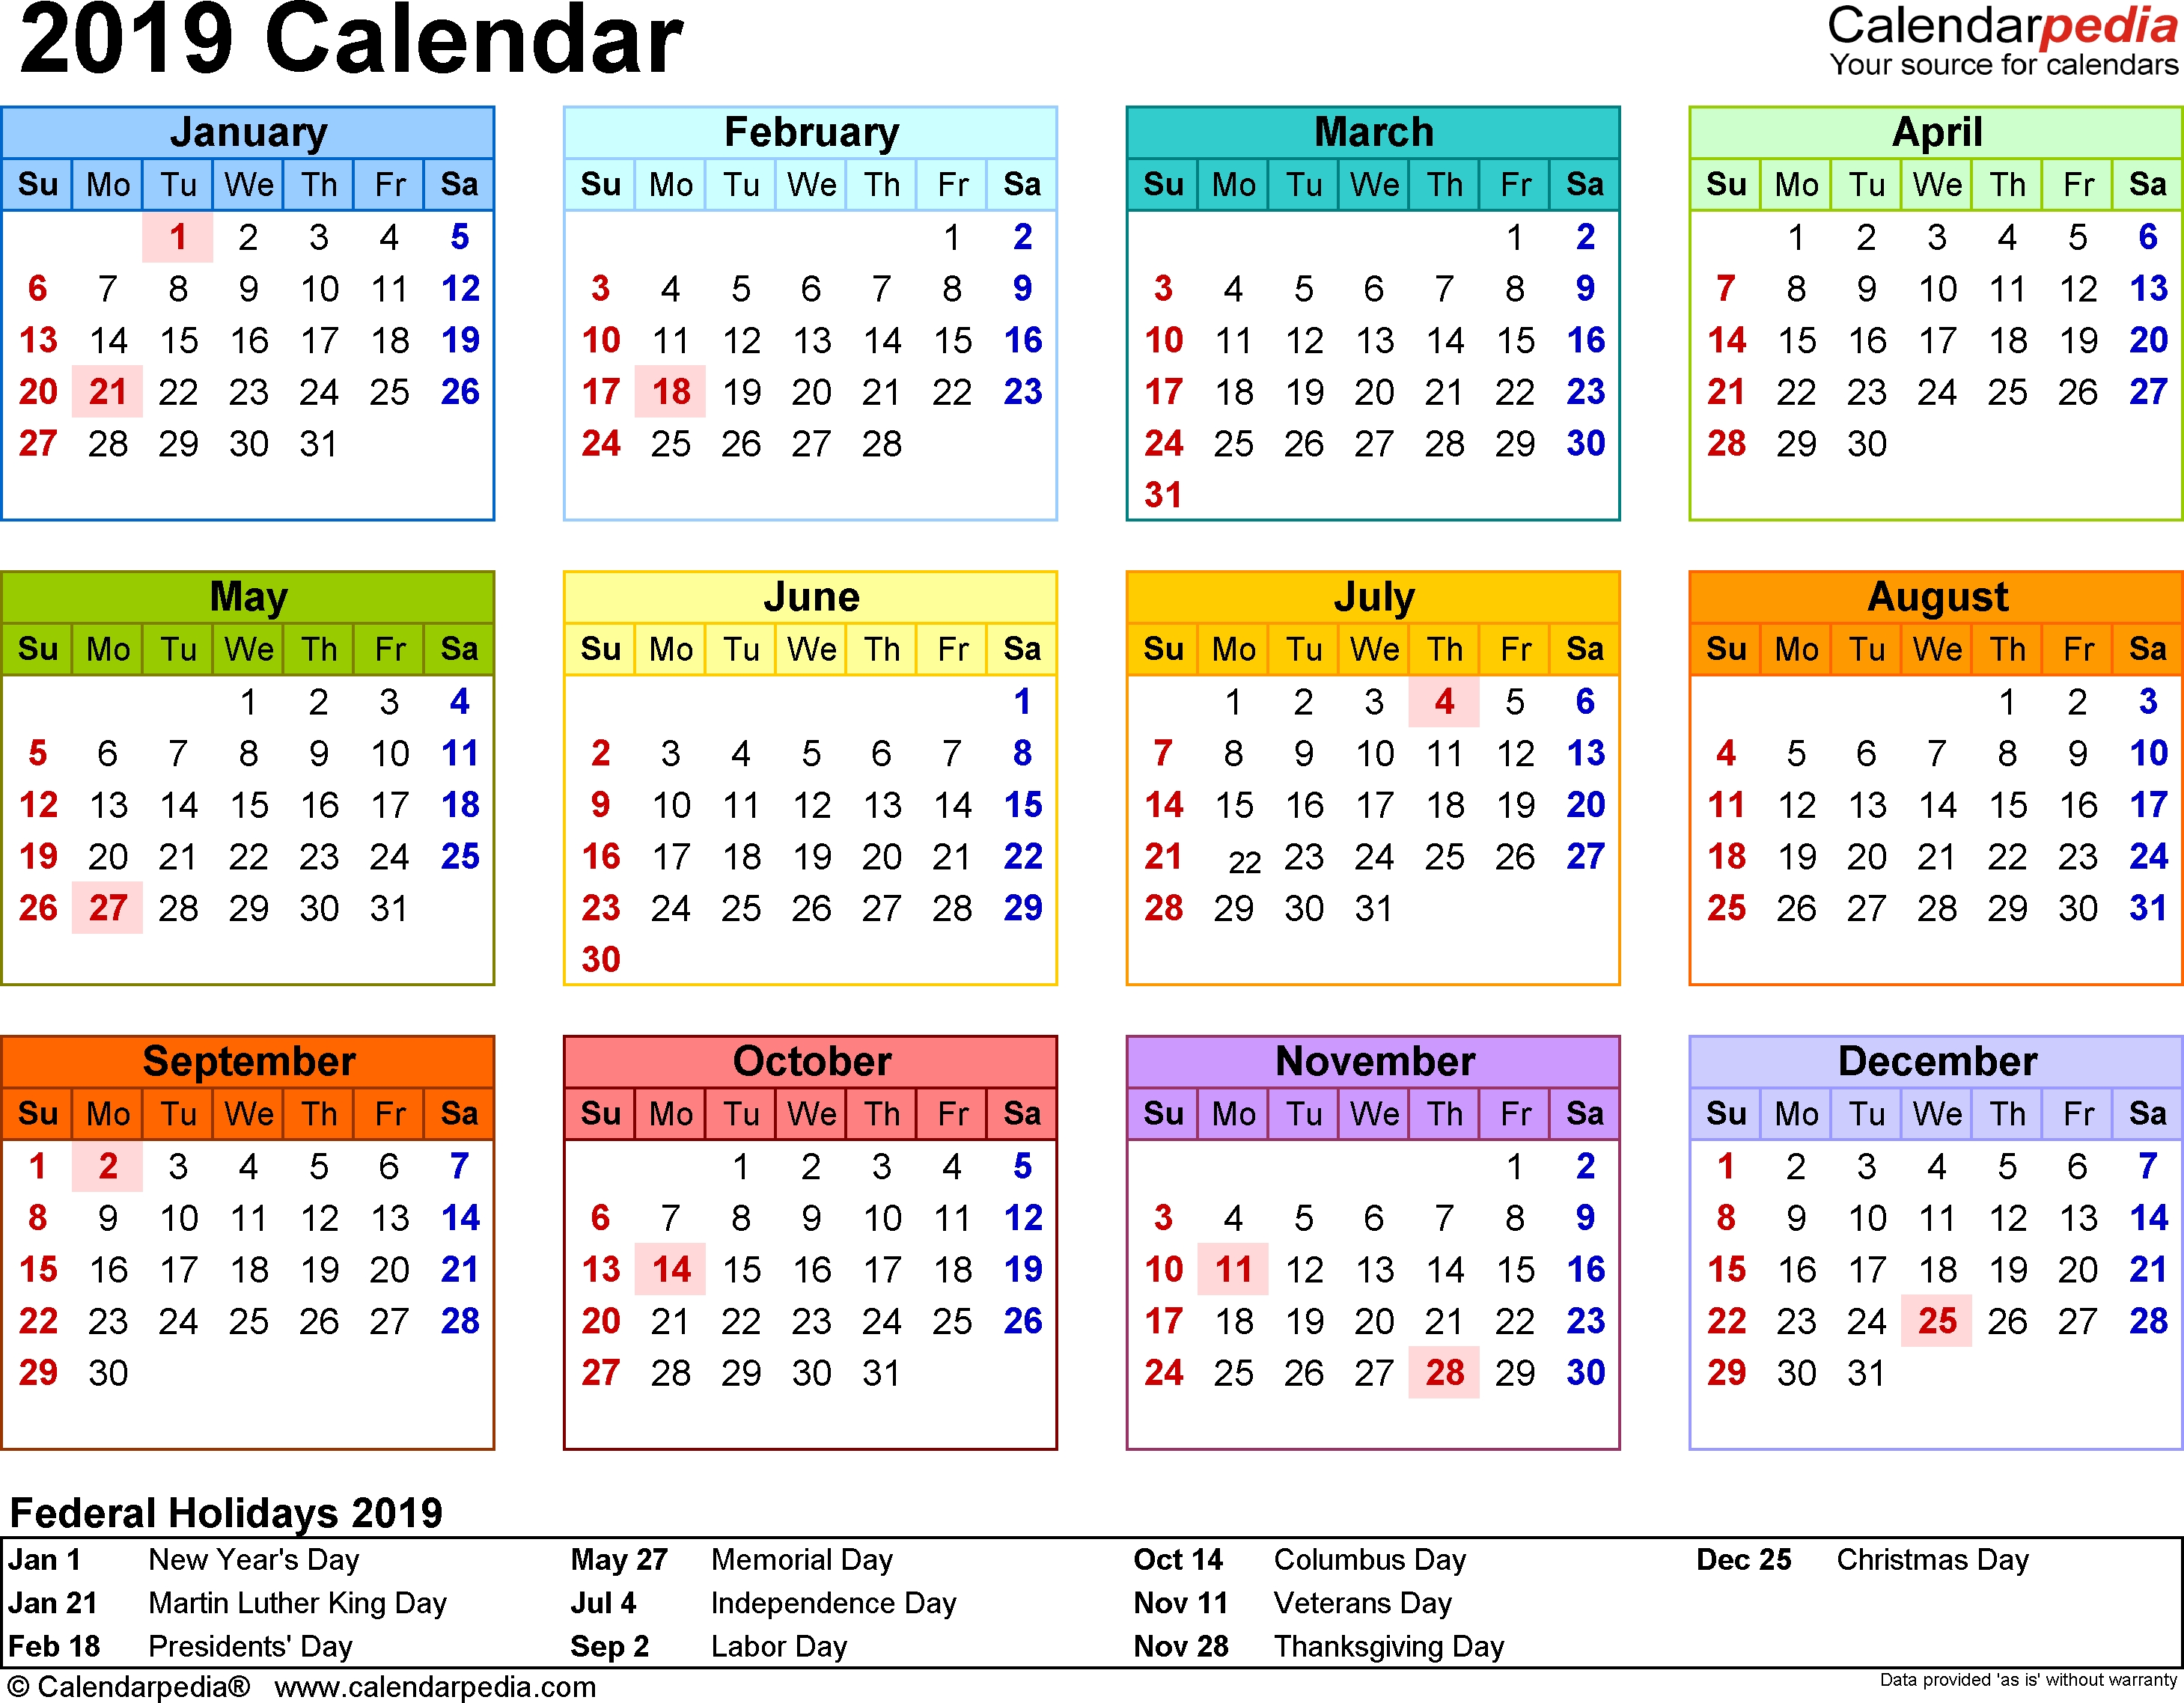 Downloadable 2019 Calendars